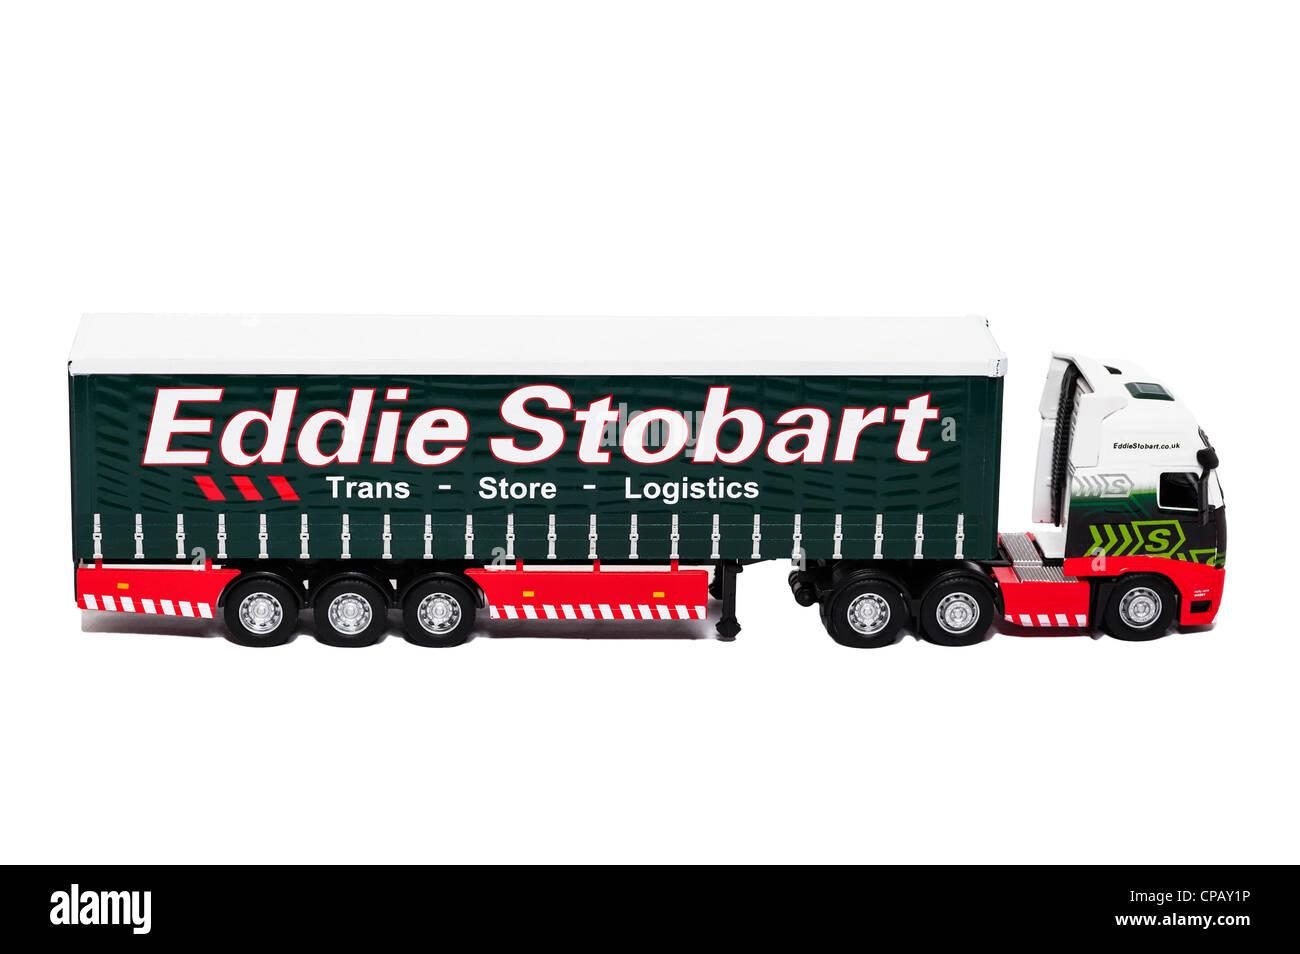 A model Eddie Stobart lorry on a white background Stock Photo